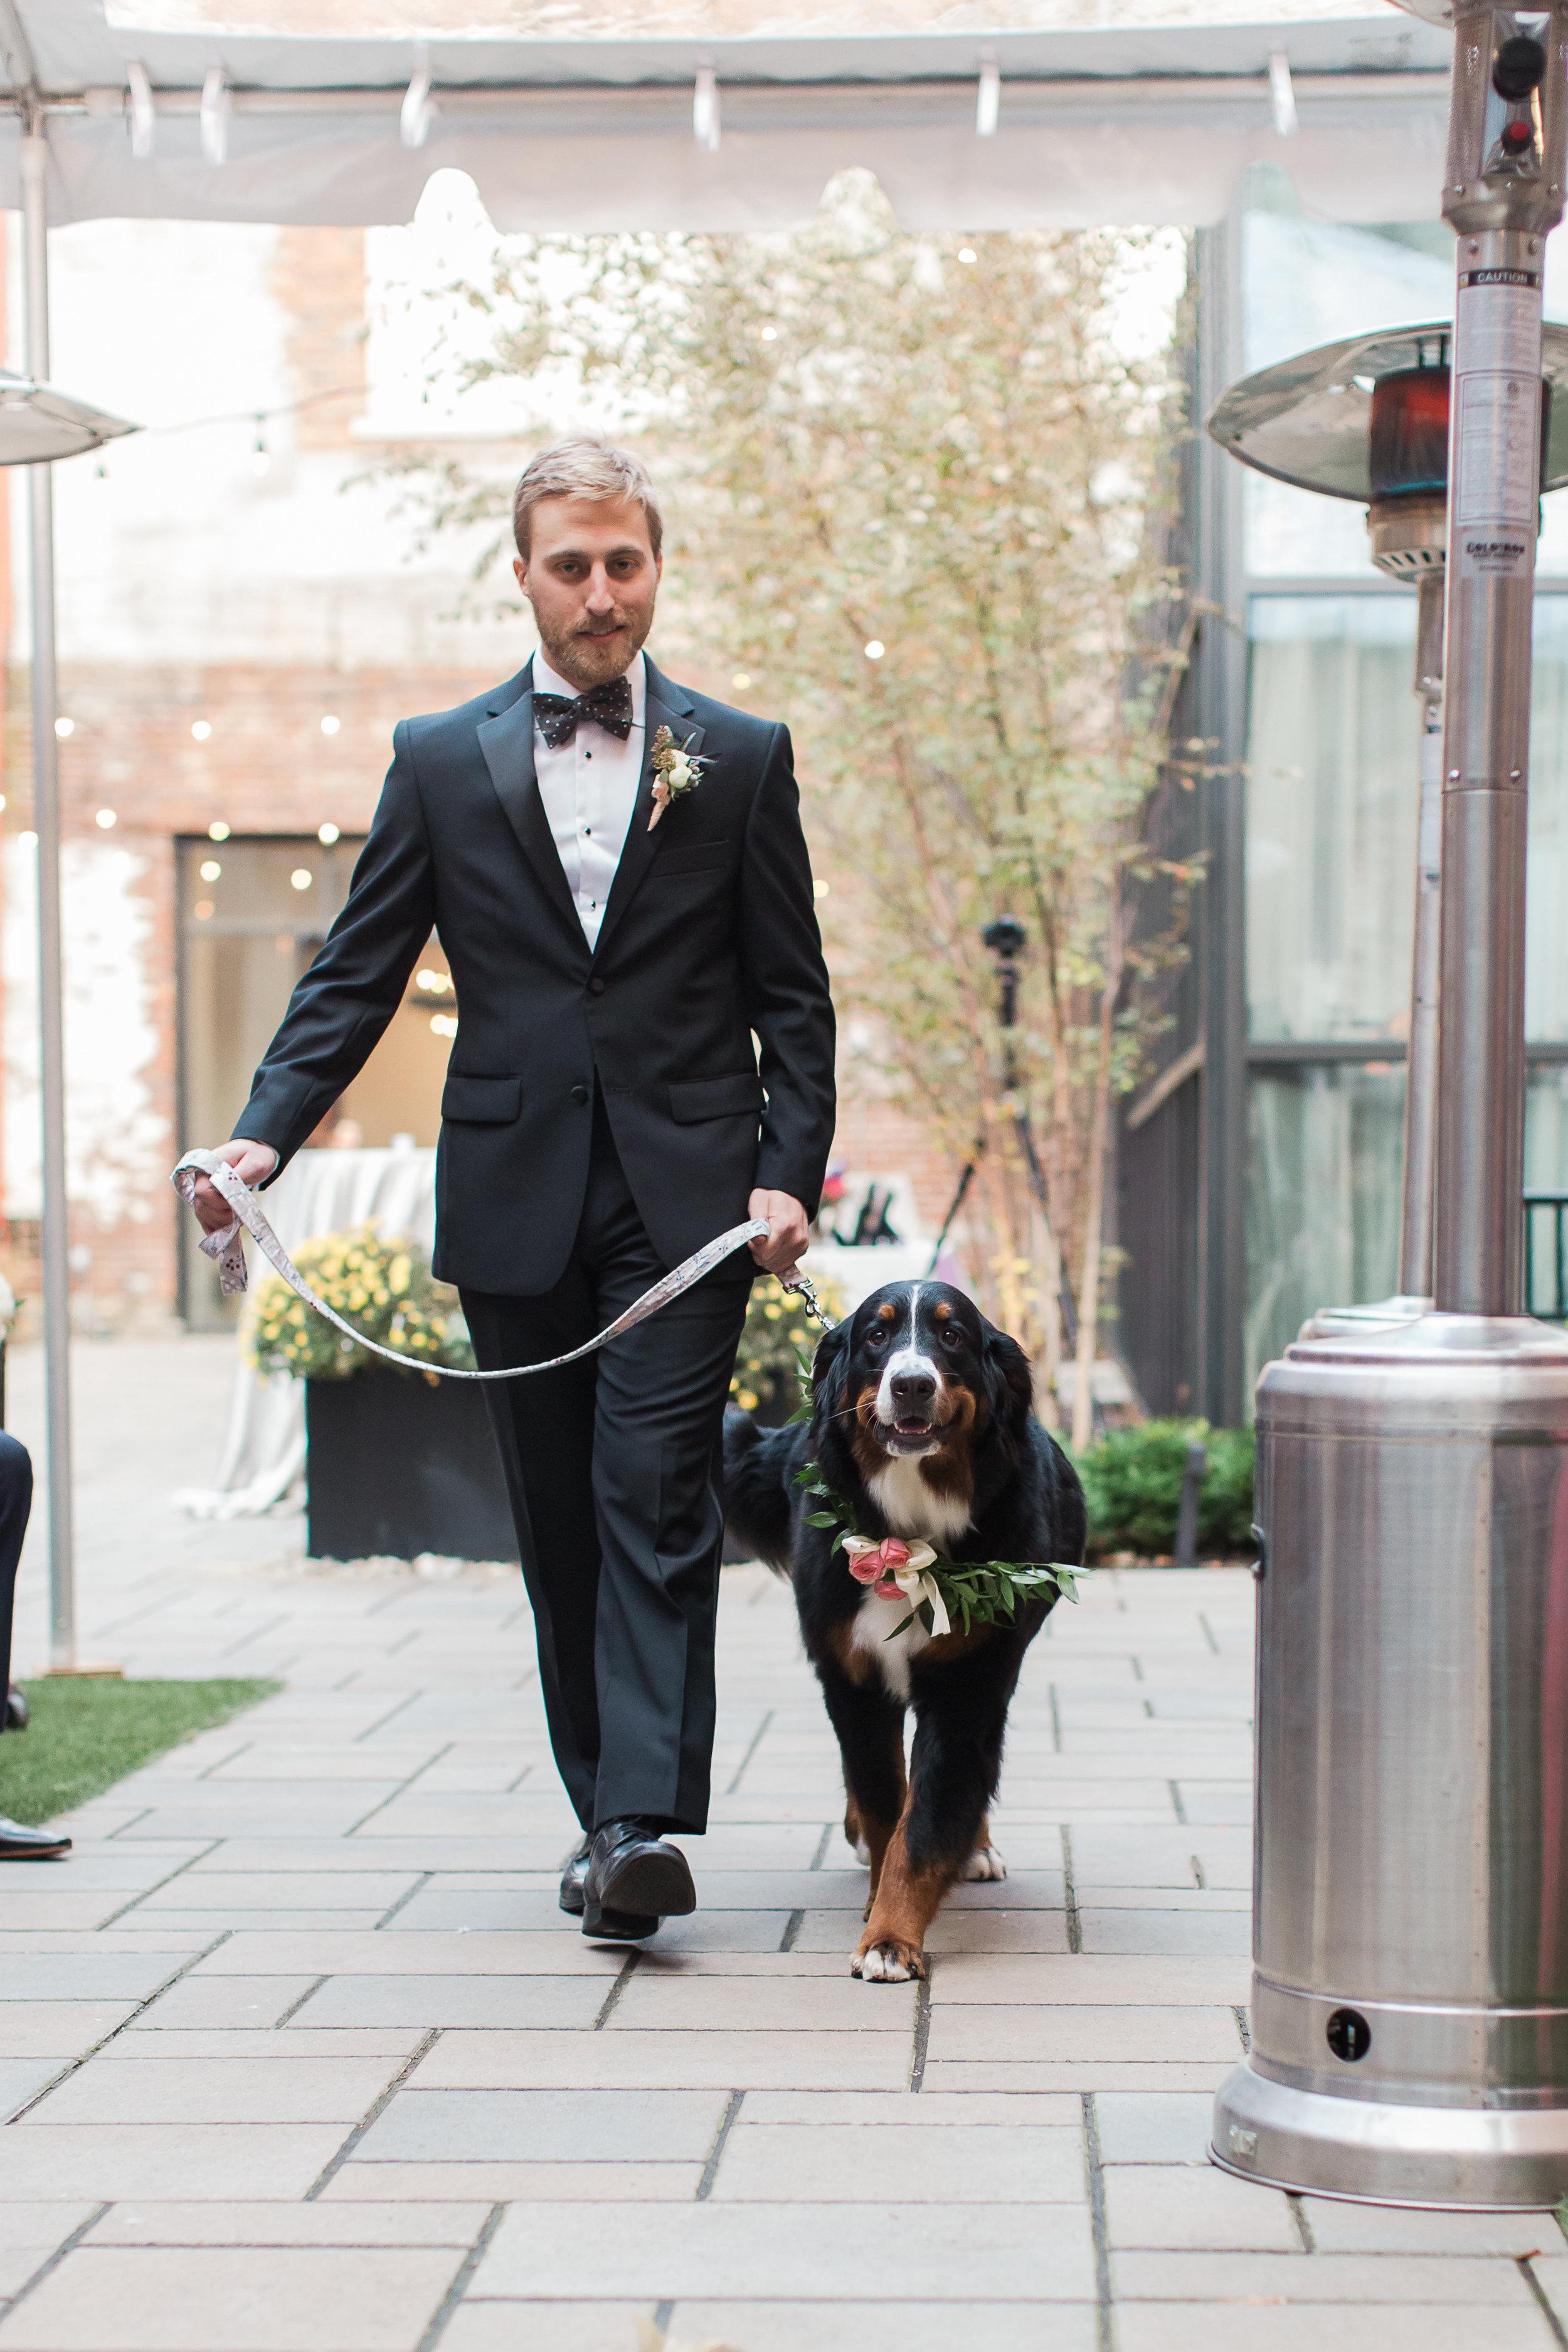 samantha-joy-events-cincinnati-wedding-planner-convington-hotel-kentucky-dog-walking-aisle-wedding